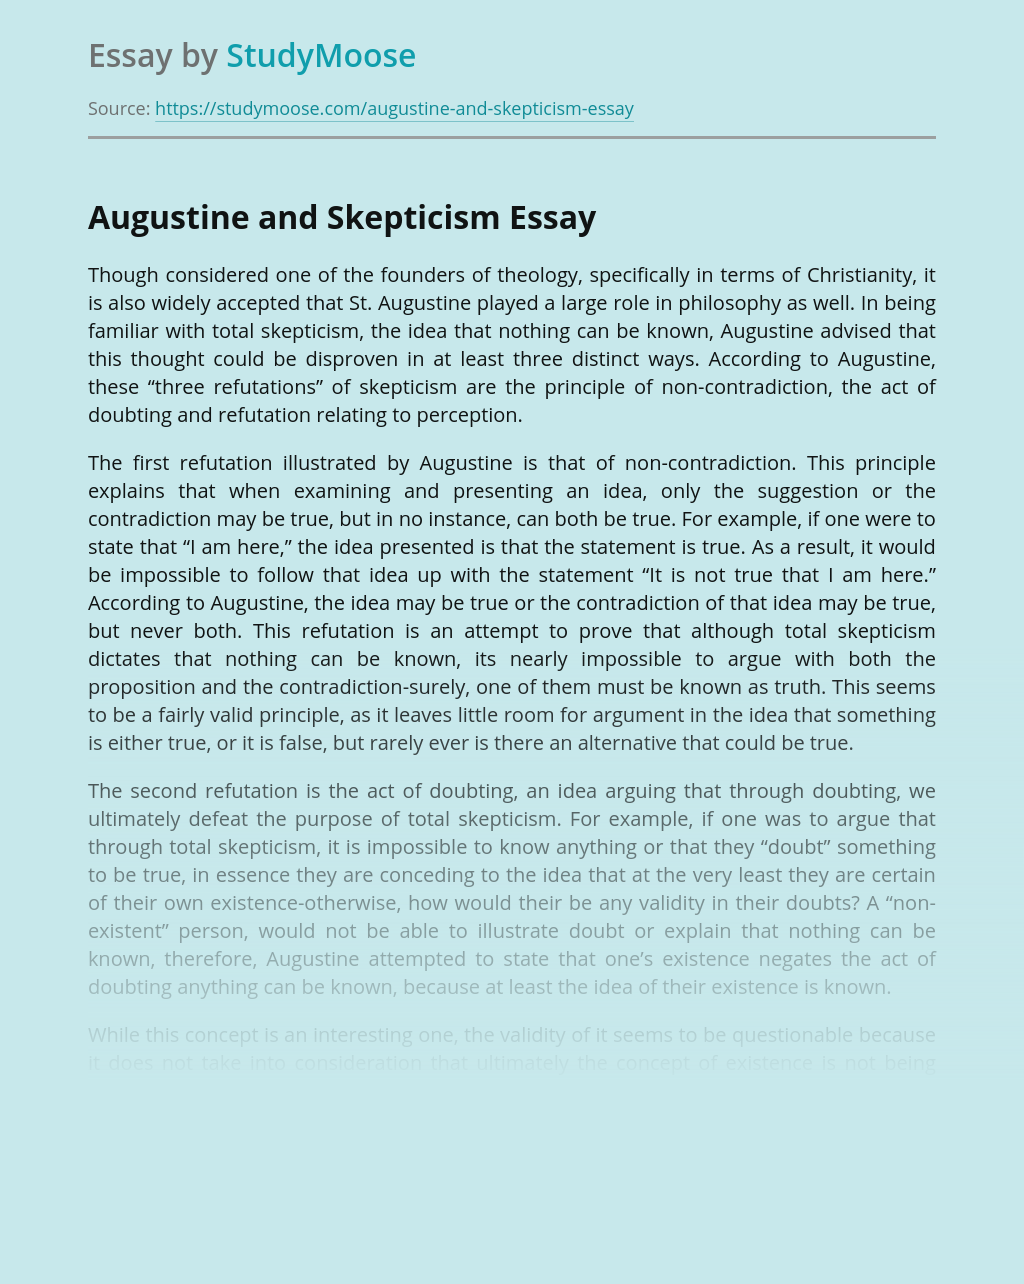 Augustine's Philosophical Views Against Skepticism